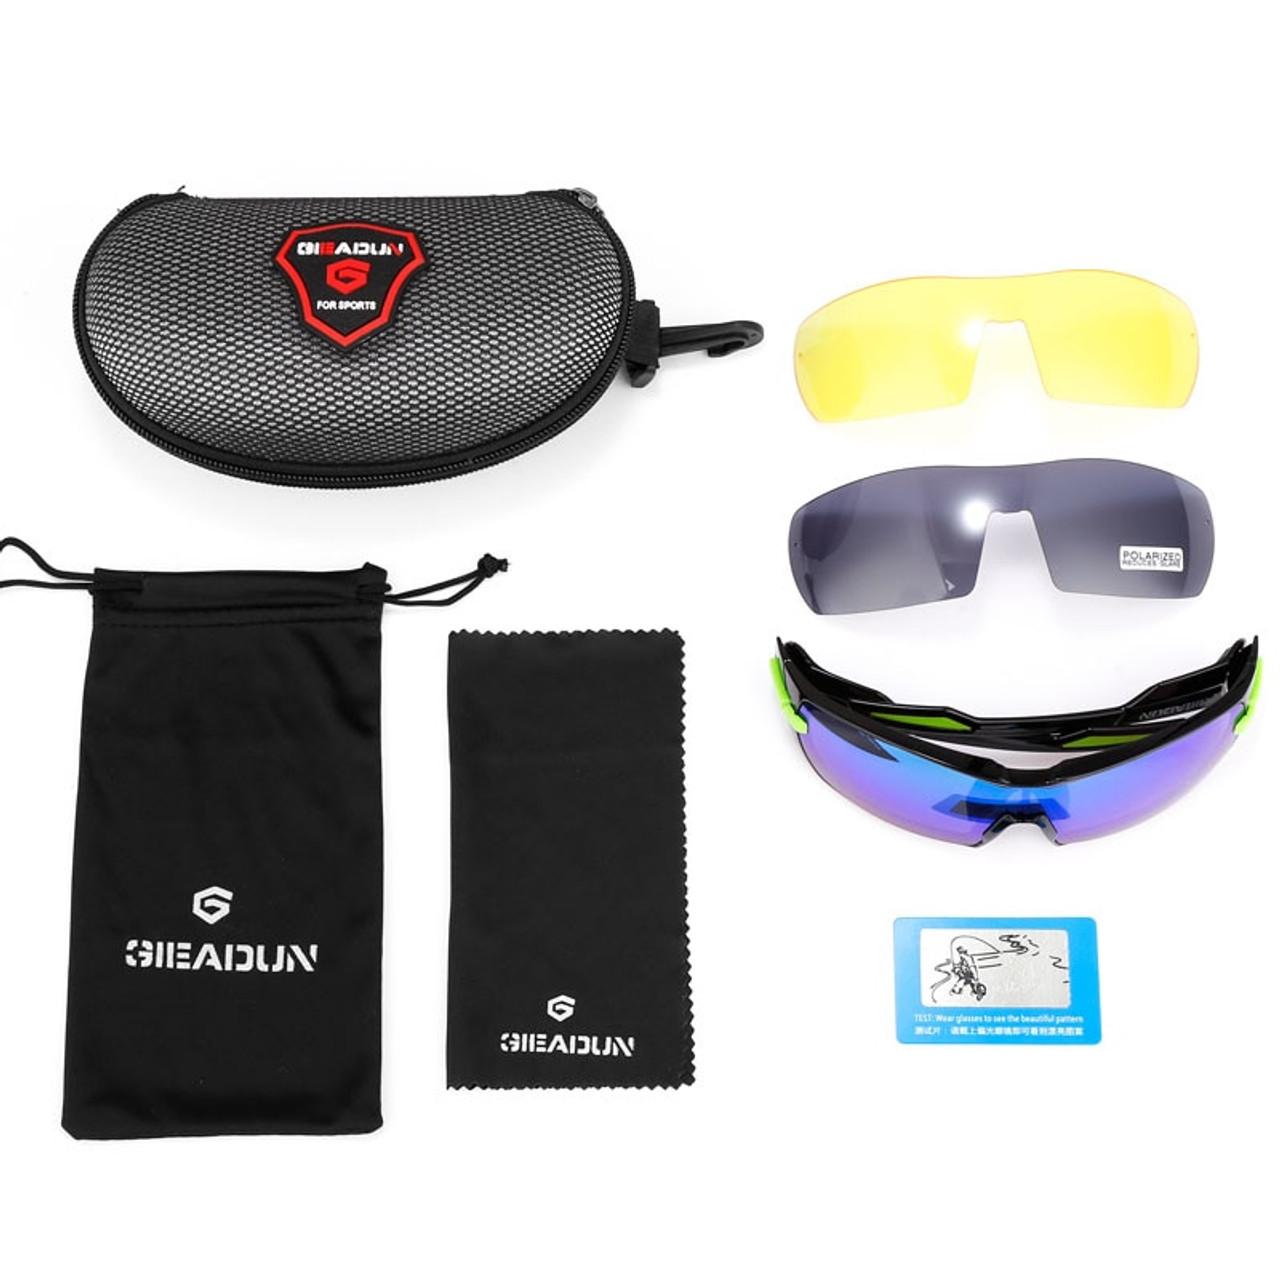 c1c0440c64cc ... Polarized Cycling SunGlasses Mountain Bike Goggles 5 Lens UV400 Cycling  Eyewear Bicycle Sunglasses Cycling Glasses 2018 ...